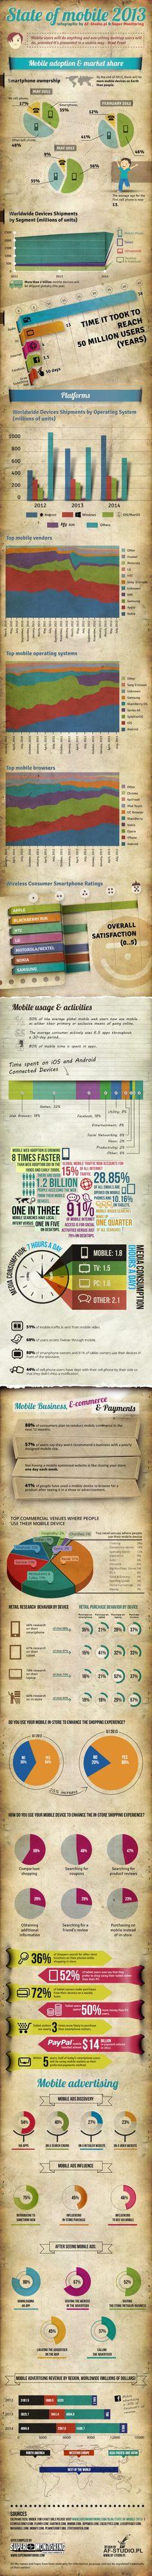 Mobiles Internet - state of mobile 2013 (Infografik)